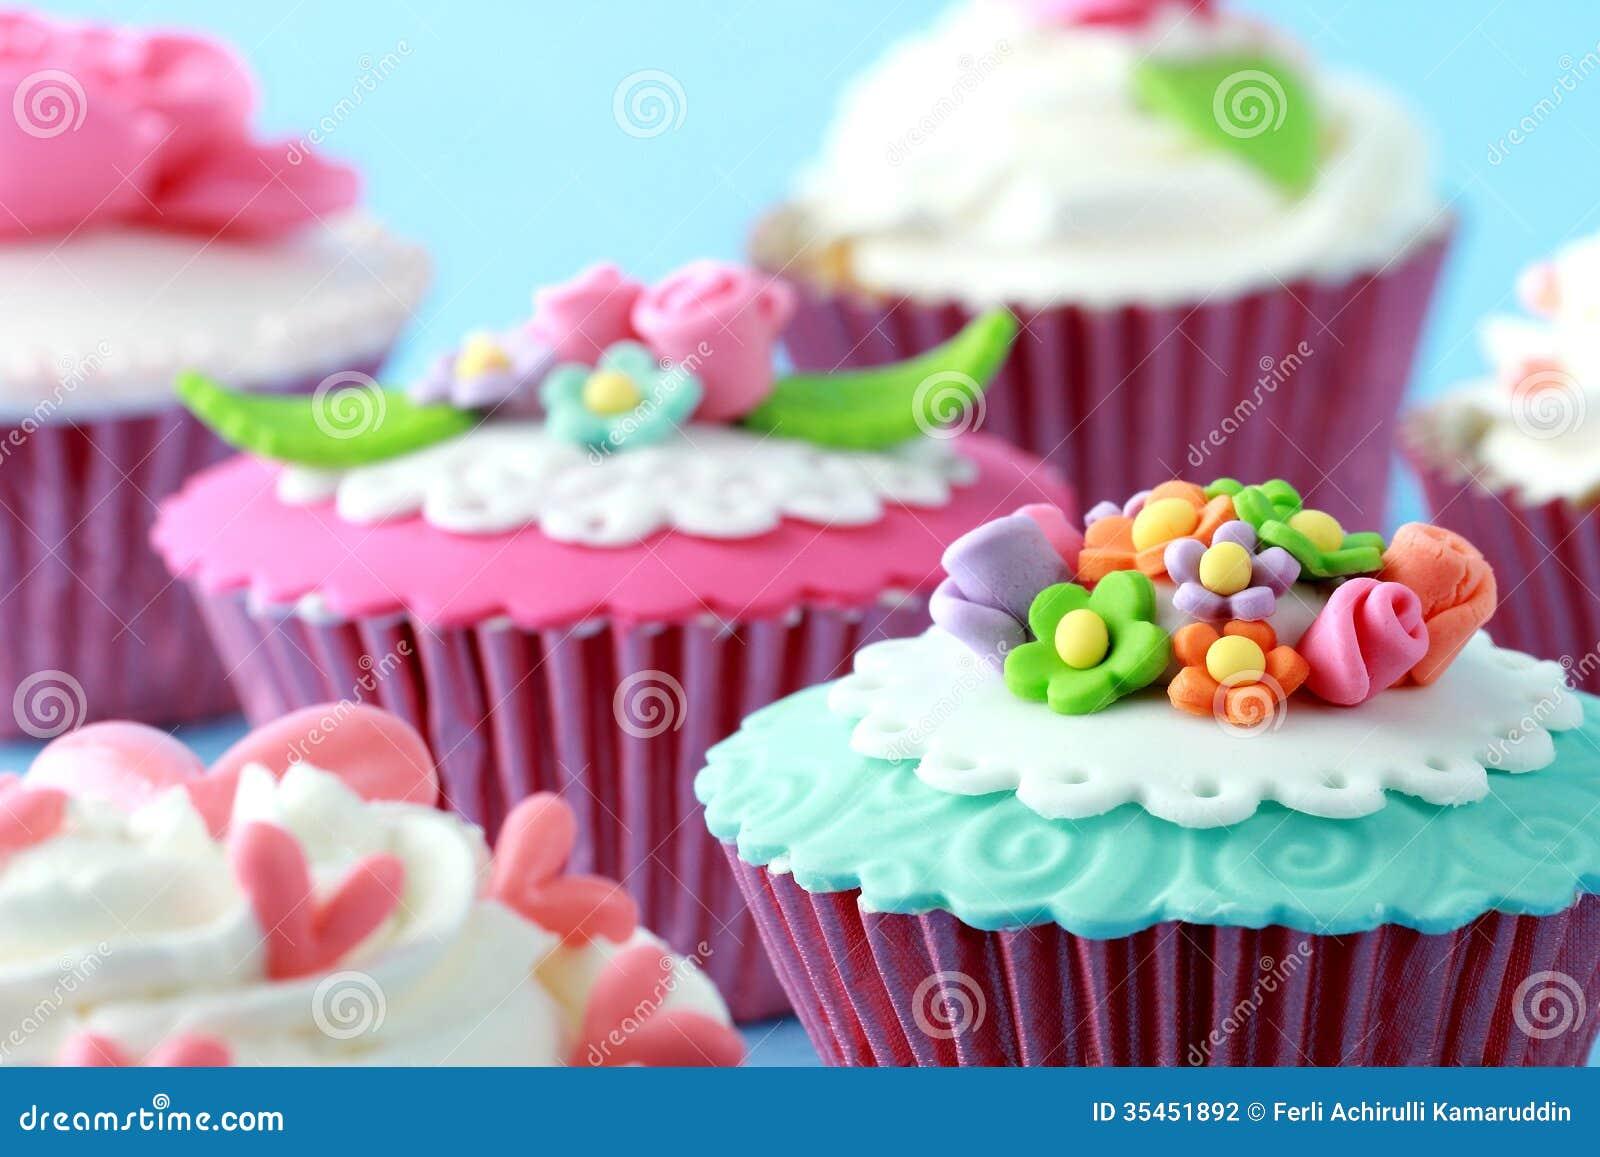 Beautiful Cupcake Images : Cupcakes Stock Photography - Image: 35451892